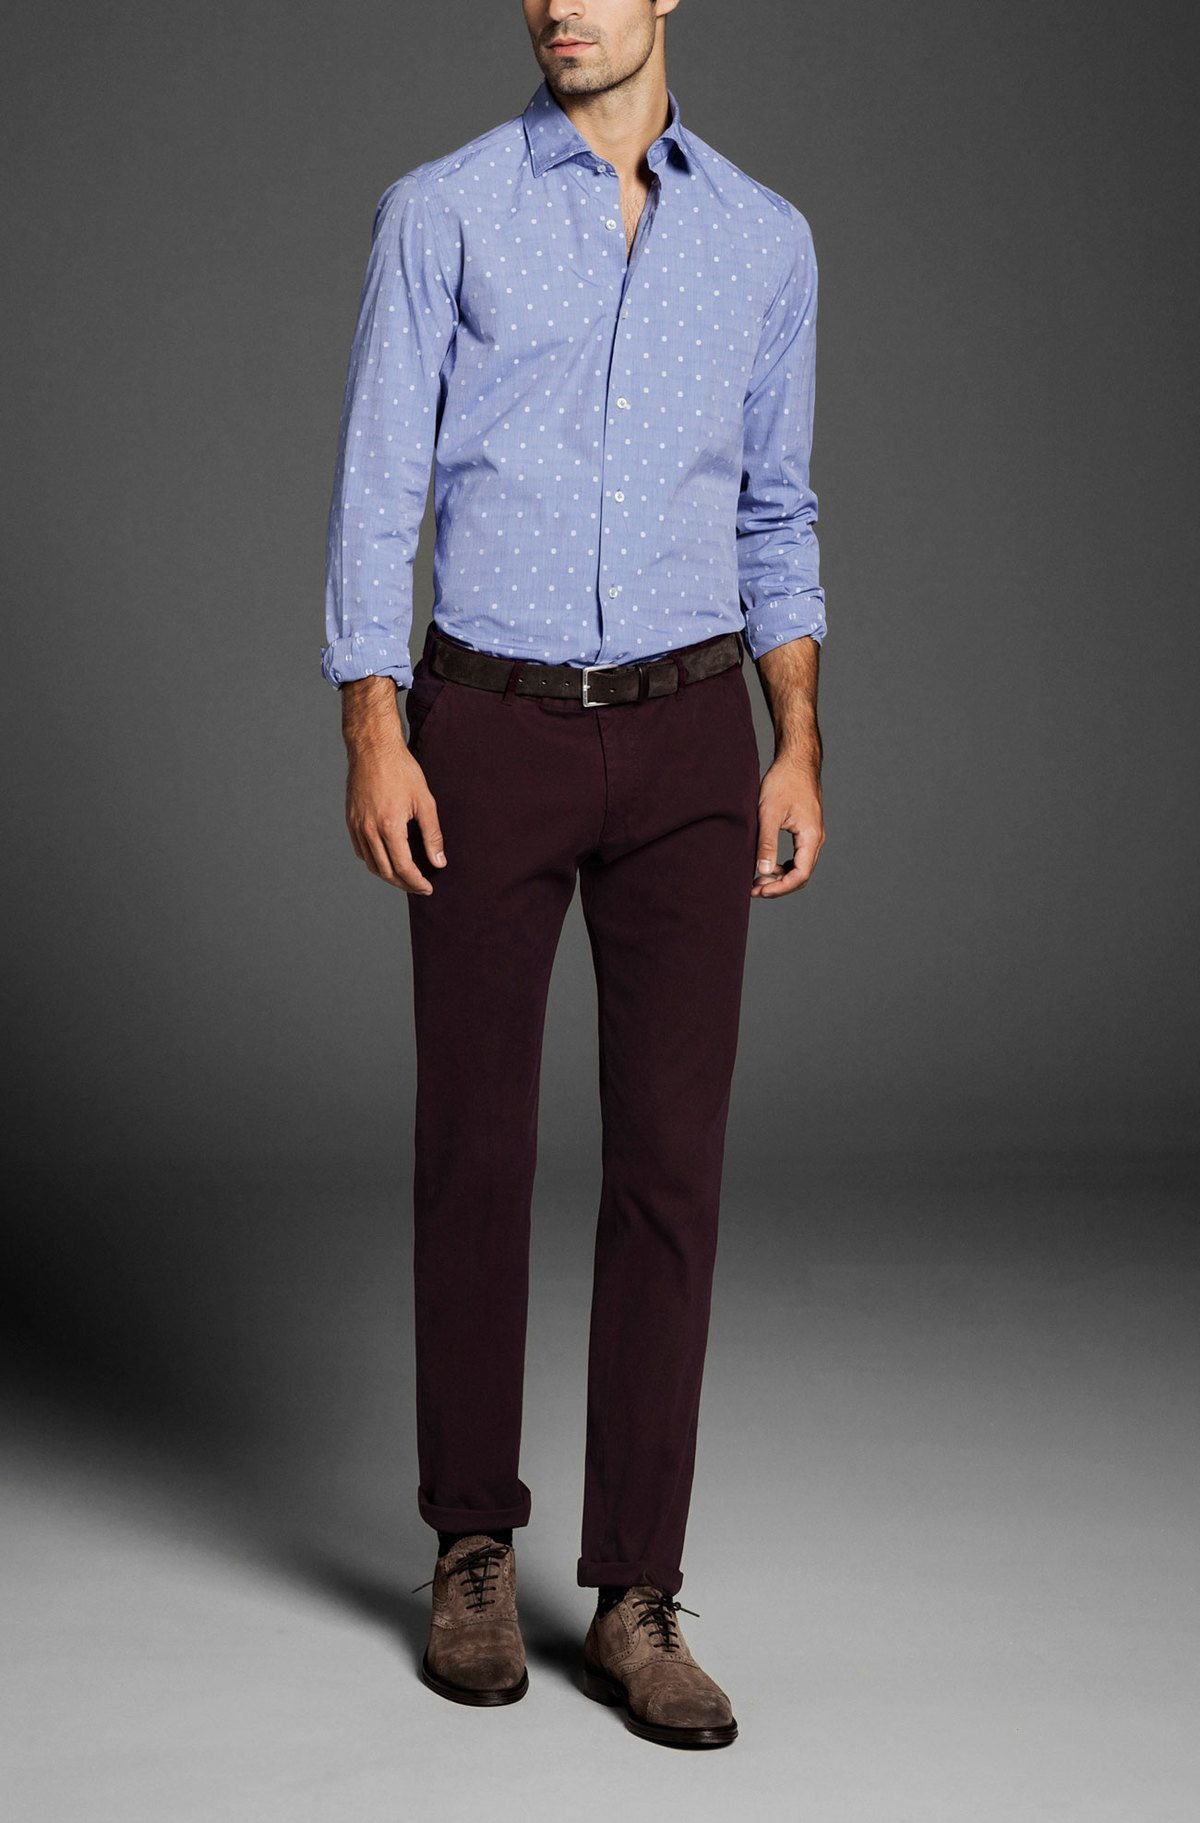 Pantalones Para Hombres Modaellos Com